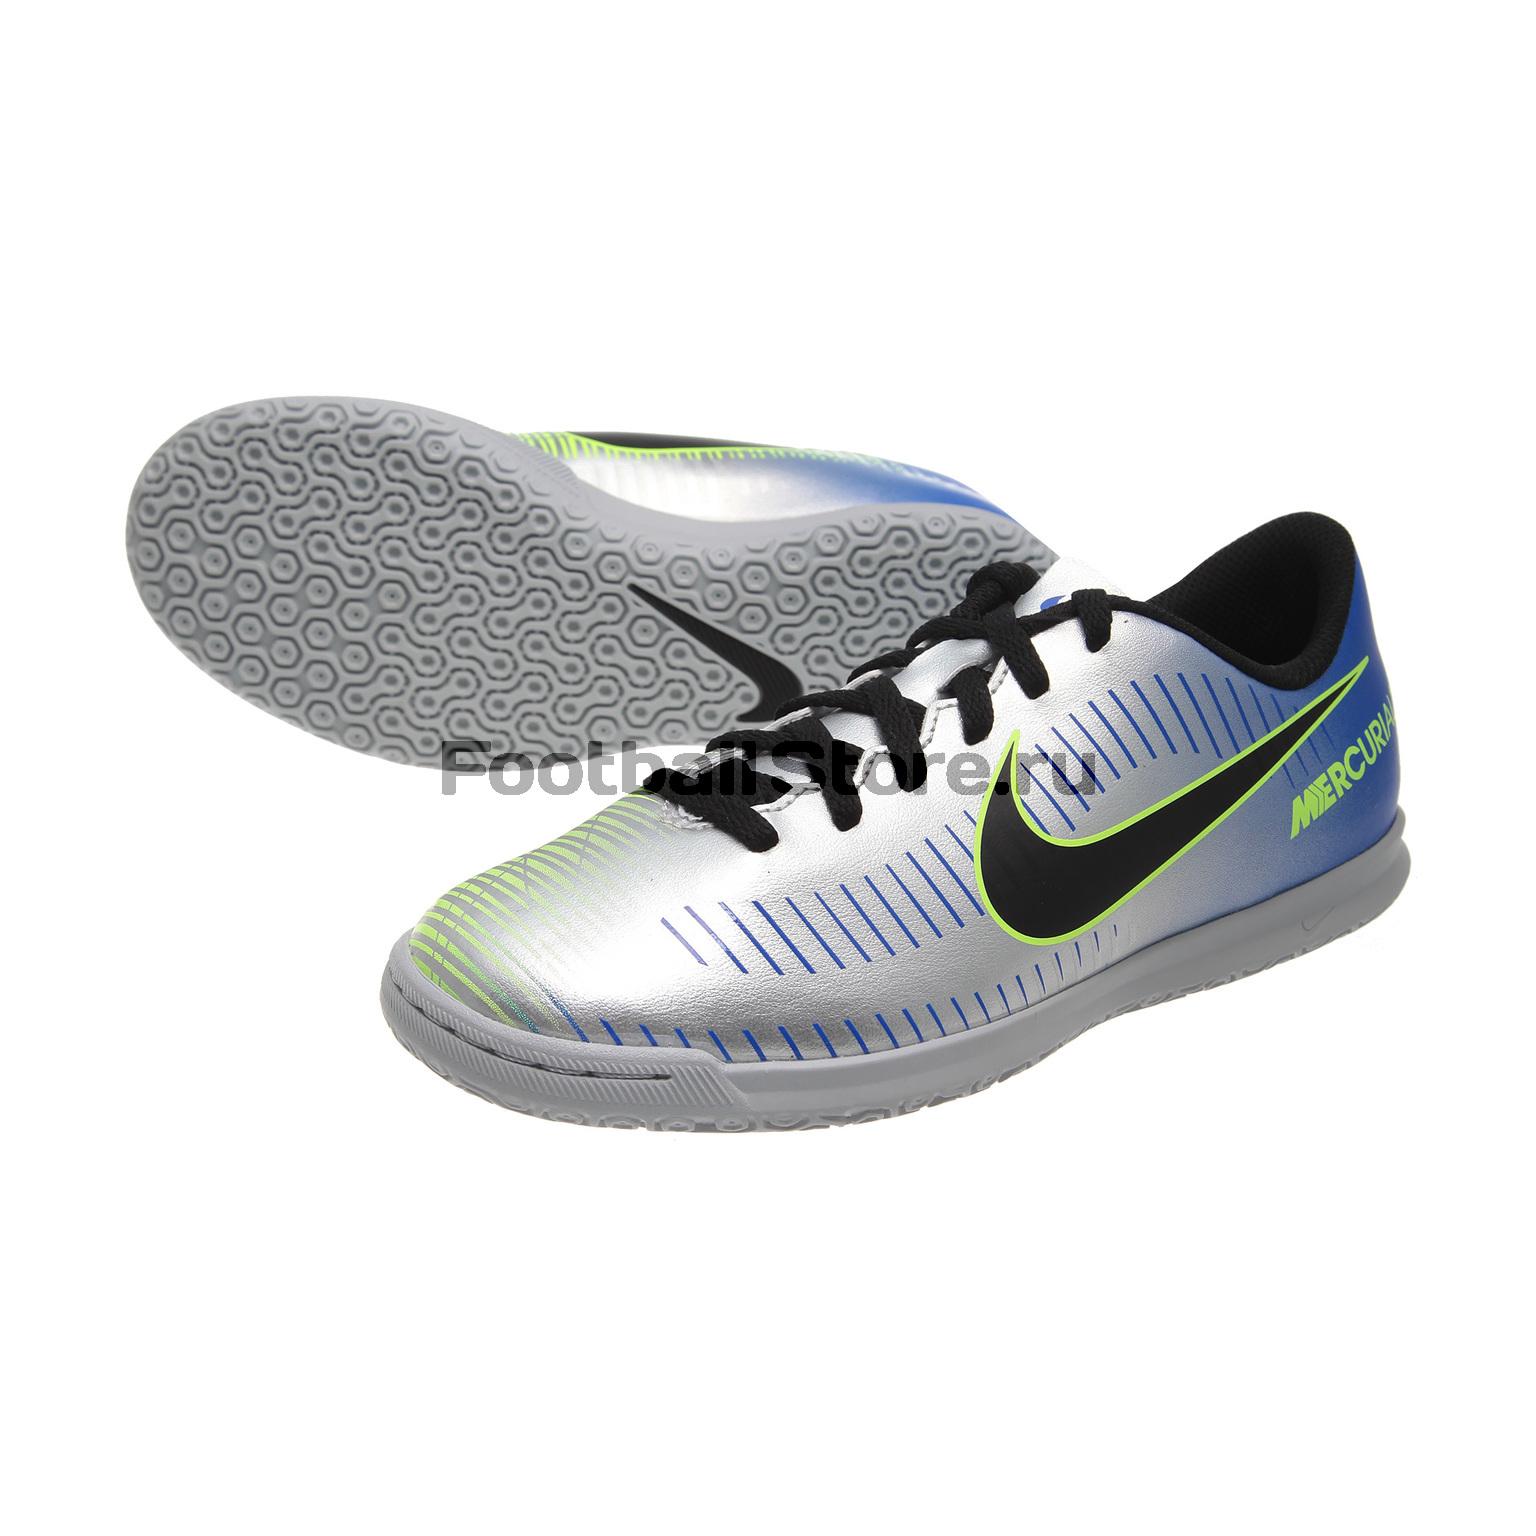 Обувь для зала Nike JR Mercurial Vortex III NJR IC 921495-407 бутсы nike jr mercurial vortex iii njr fg 921490 407